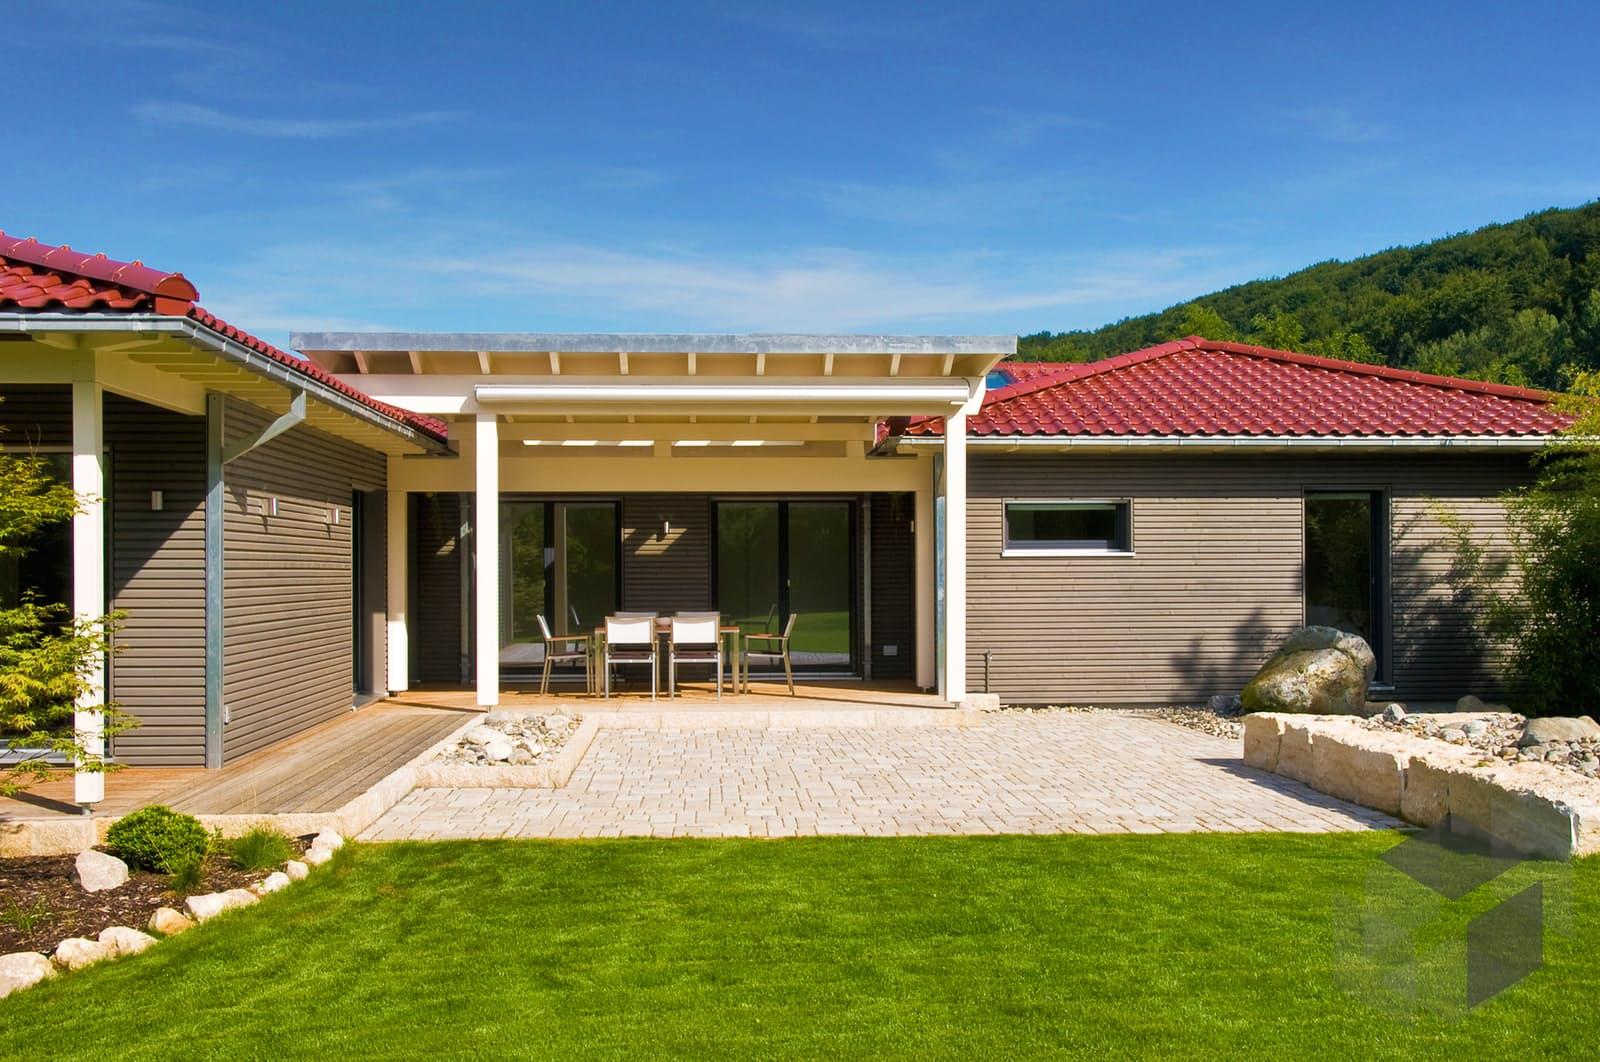 klassische bungalow von baufritz komplette daten bersicht. Black Bedroom Furniture Sets. Home Design Ideas